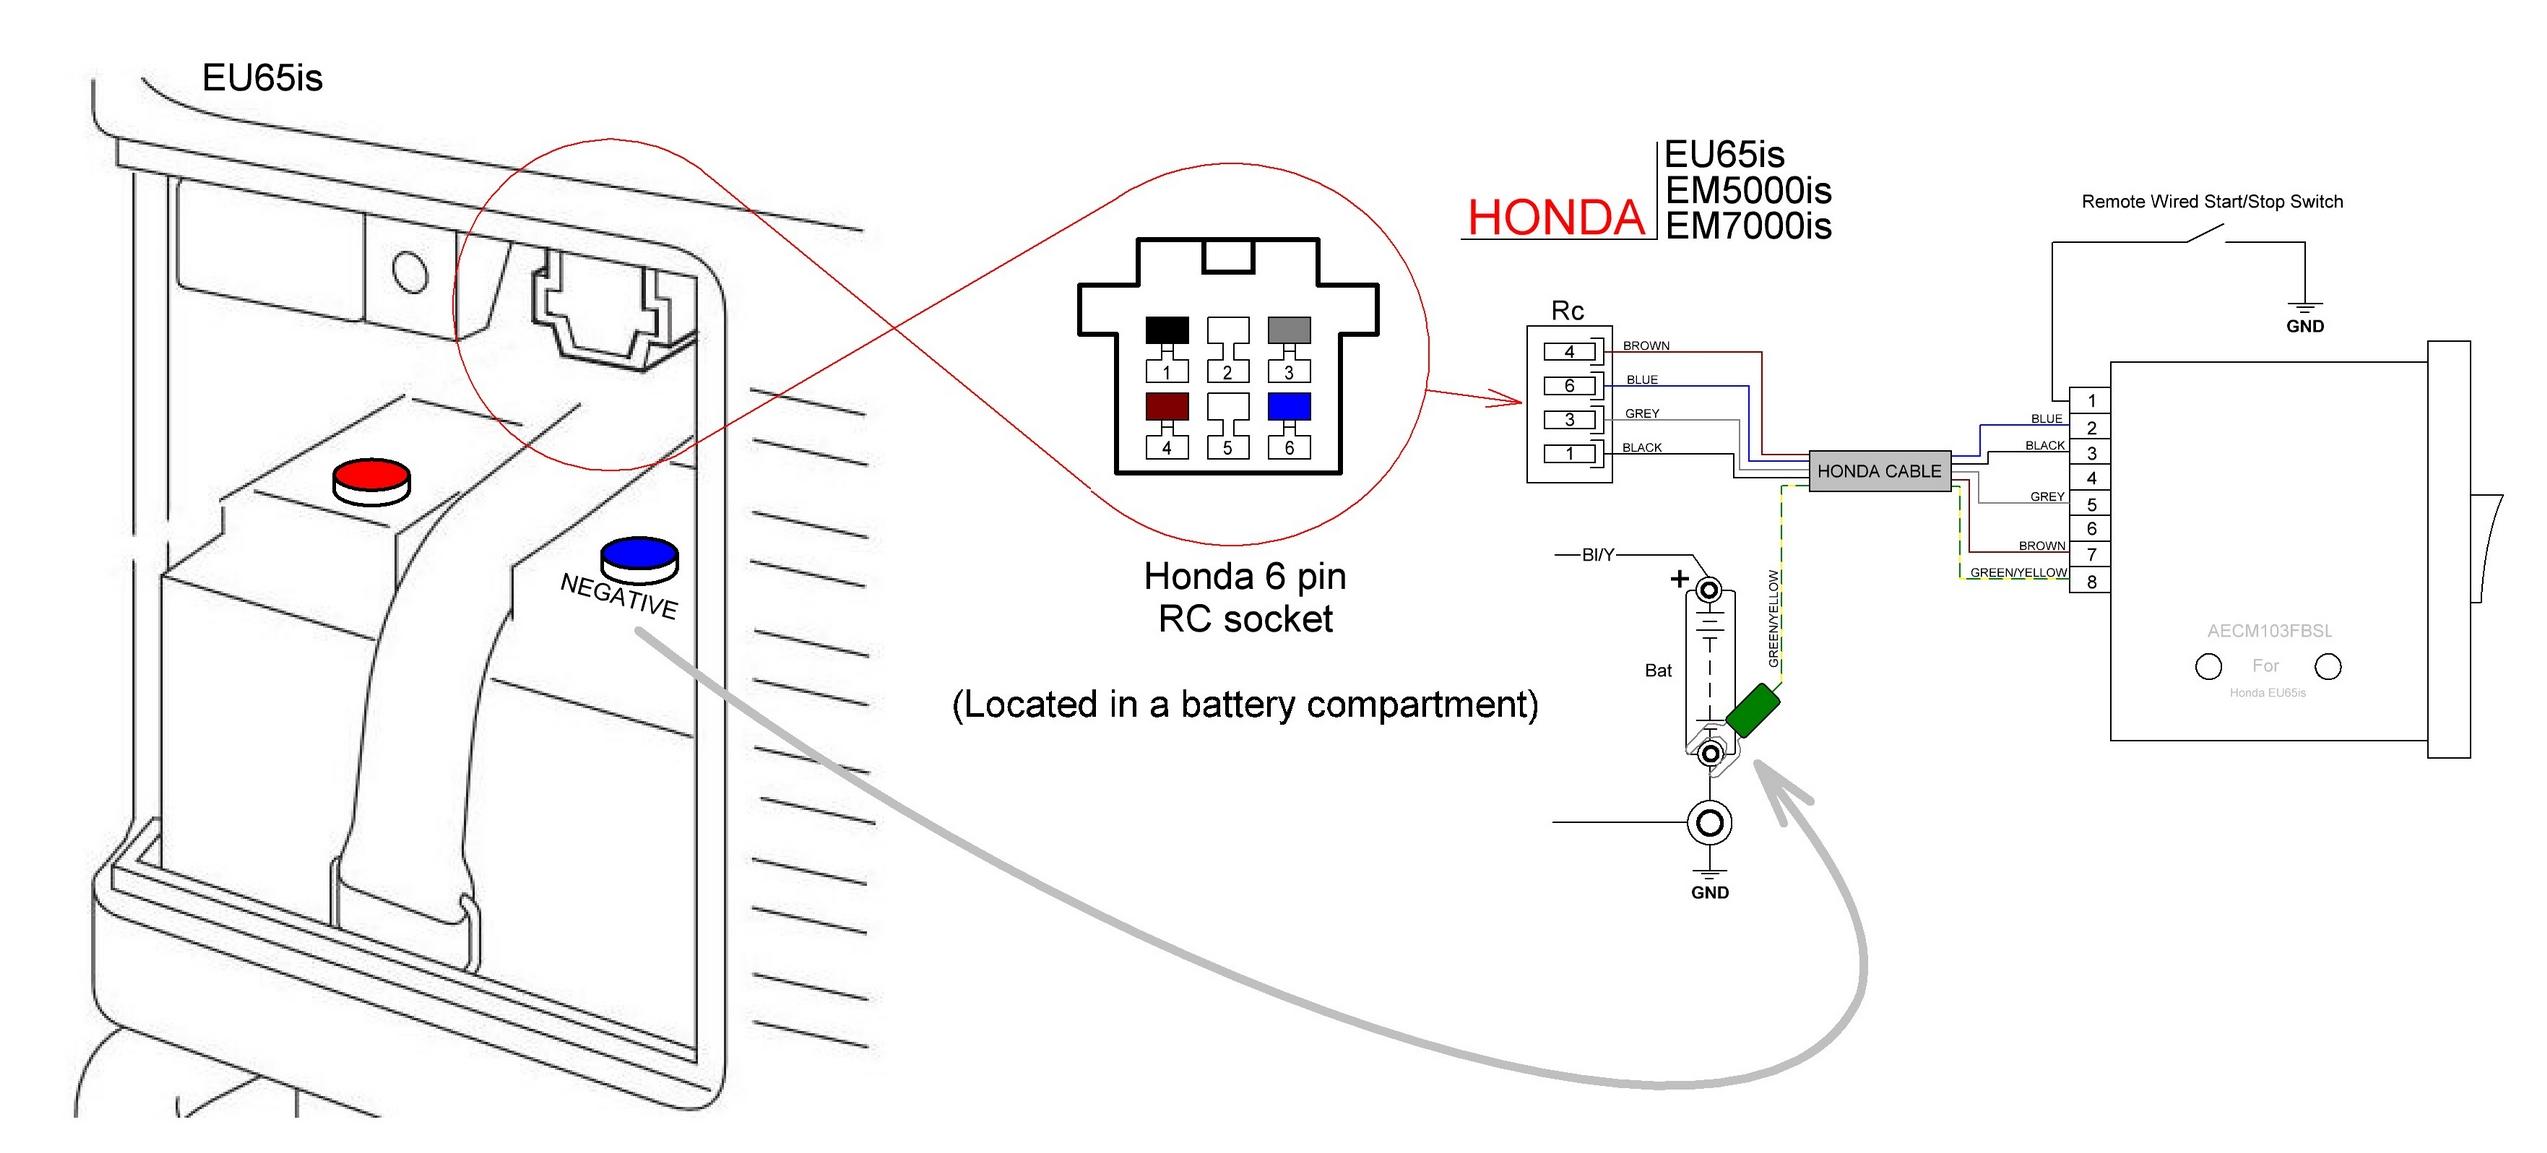 HONDA EU65is Auto Start - Automatic Generator Control Modules